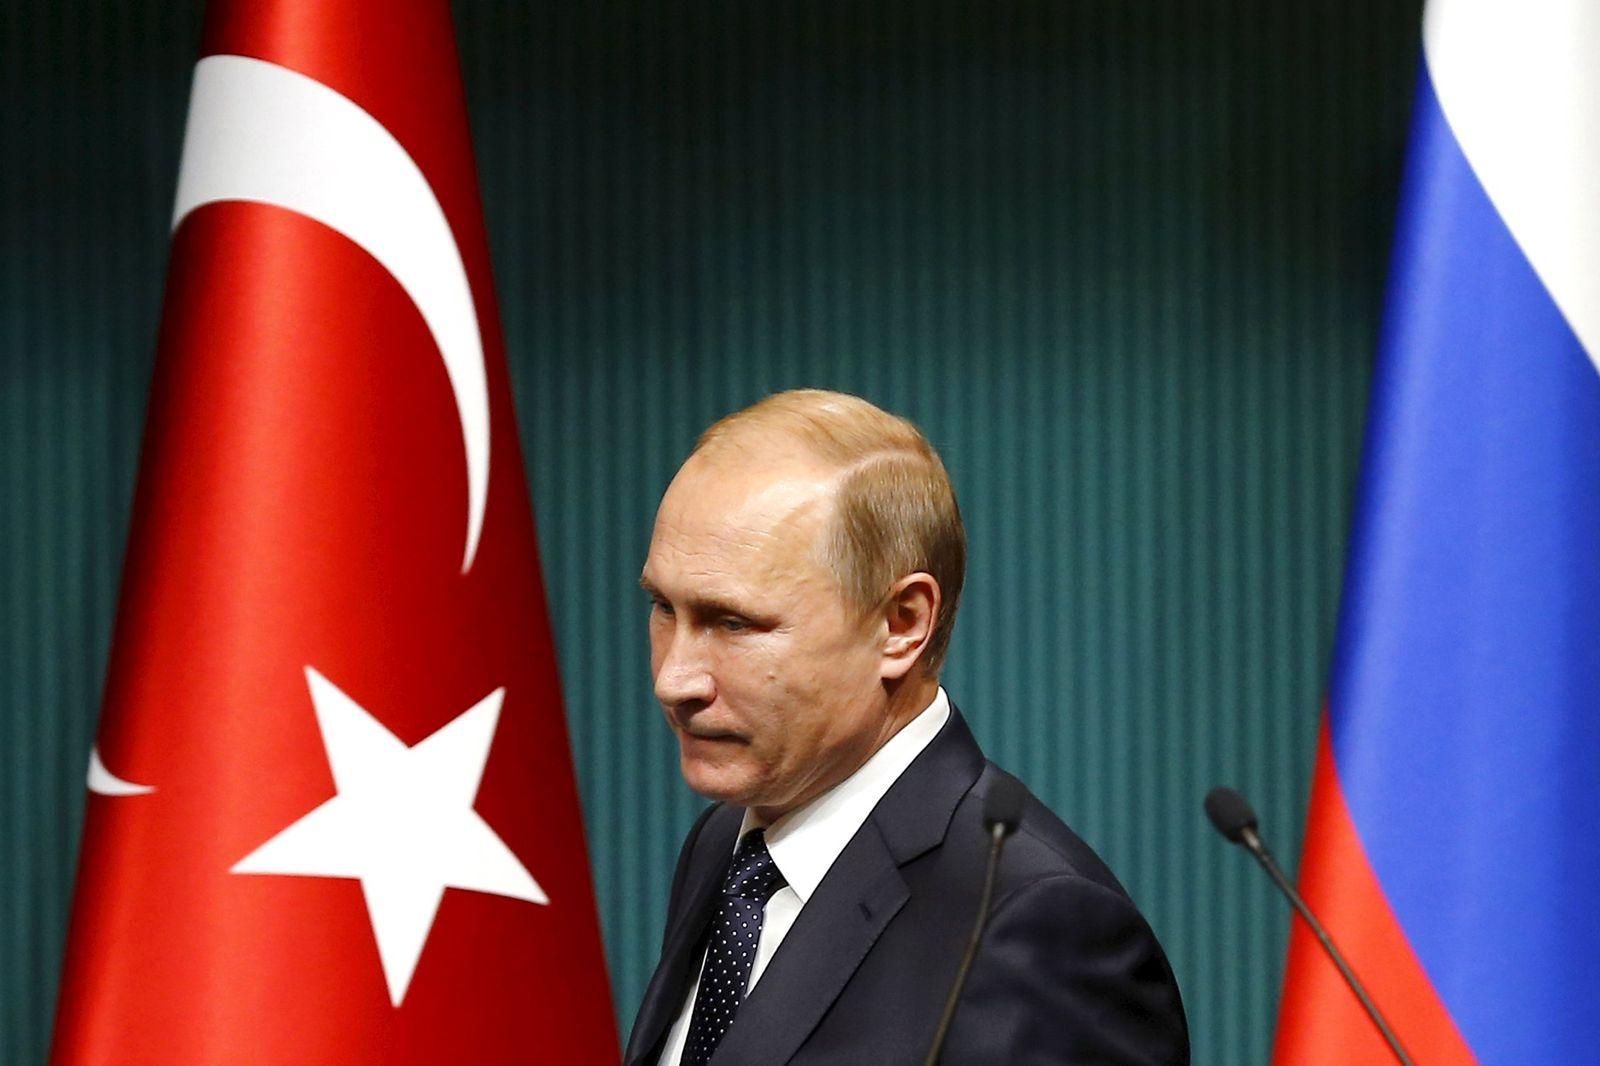 MIDEAST-CRISIS/TURKEY-RUSSIA-PUTIN